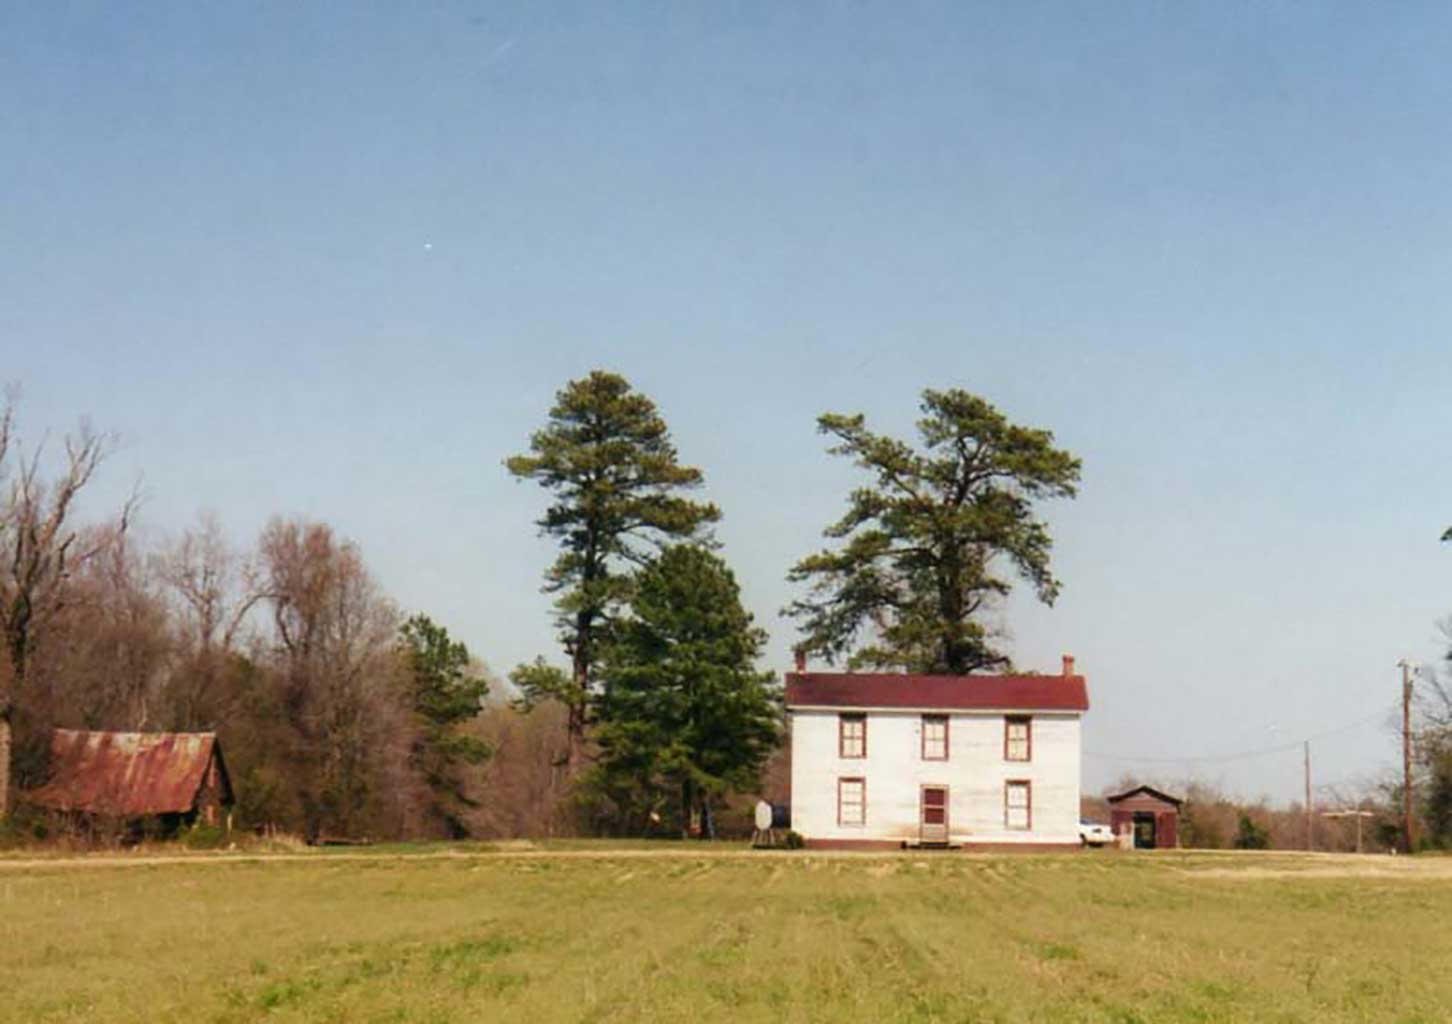 norfleet-farm-house-godwin-blvd-1996-img301